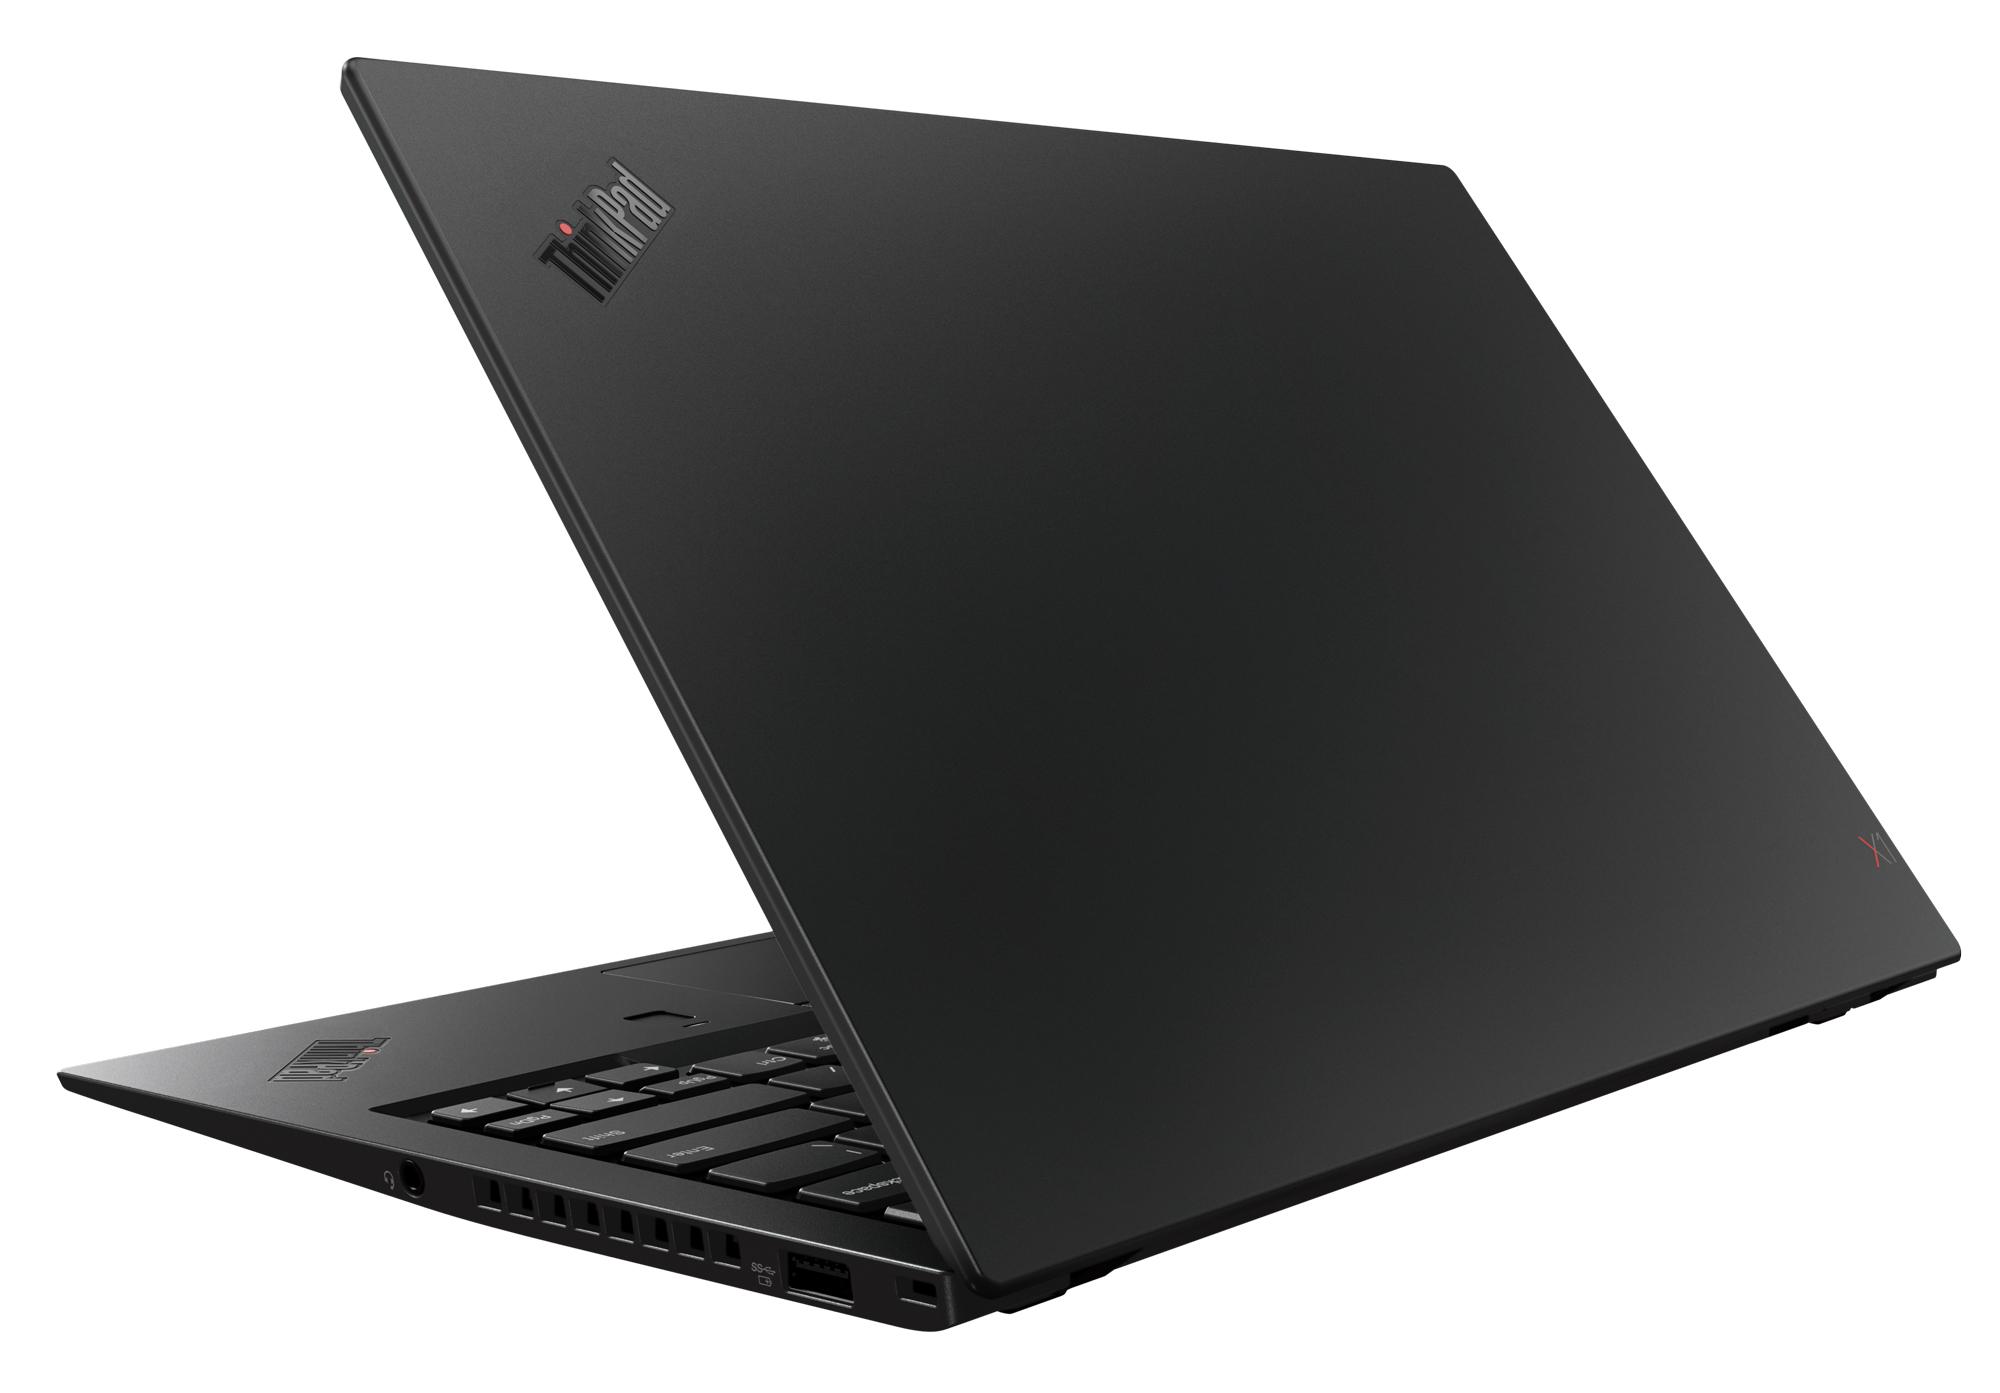 Фото  Ультрабук ThinkPad X1 Carbon 6th Gen (20KH003BRT)